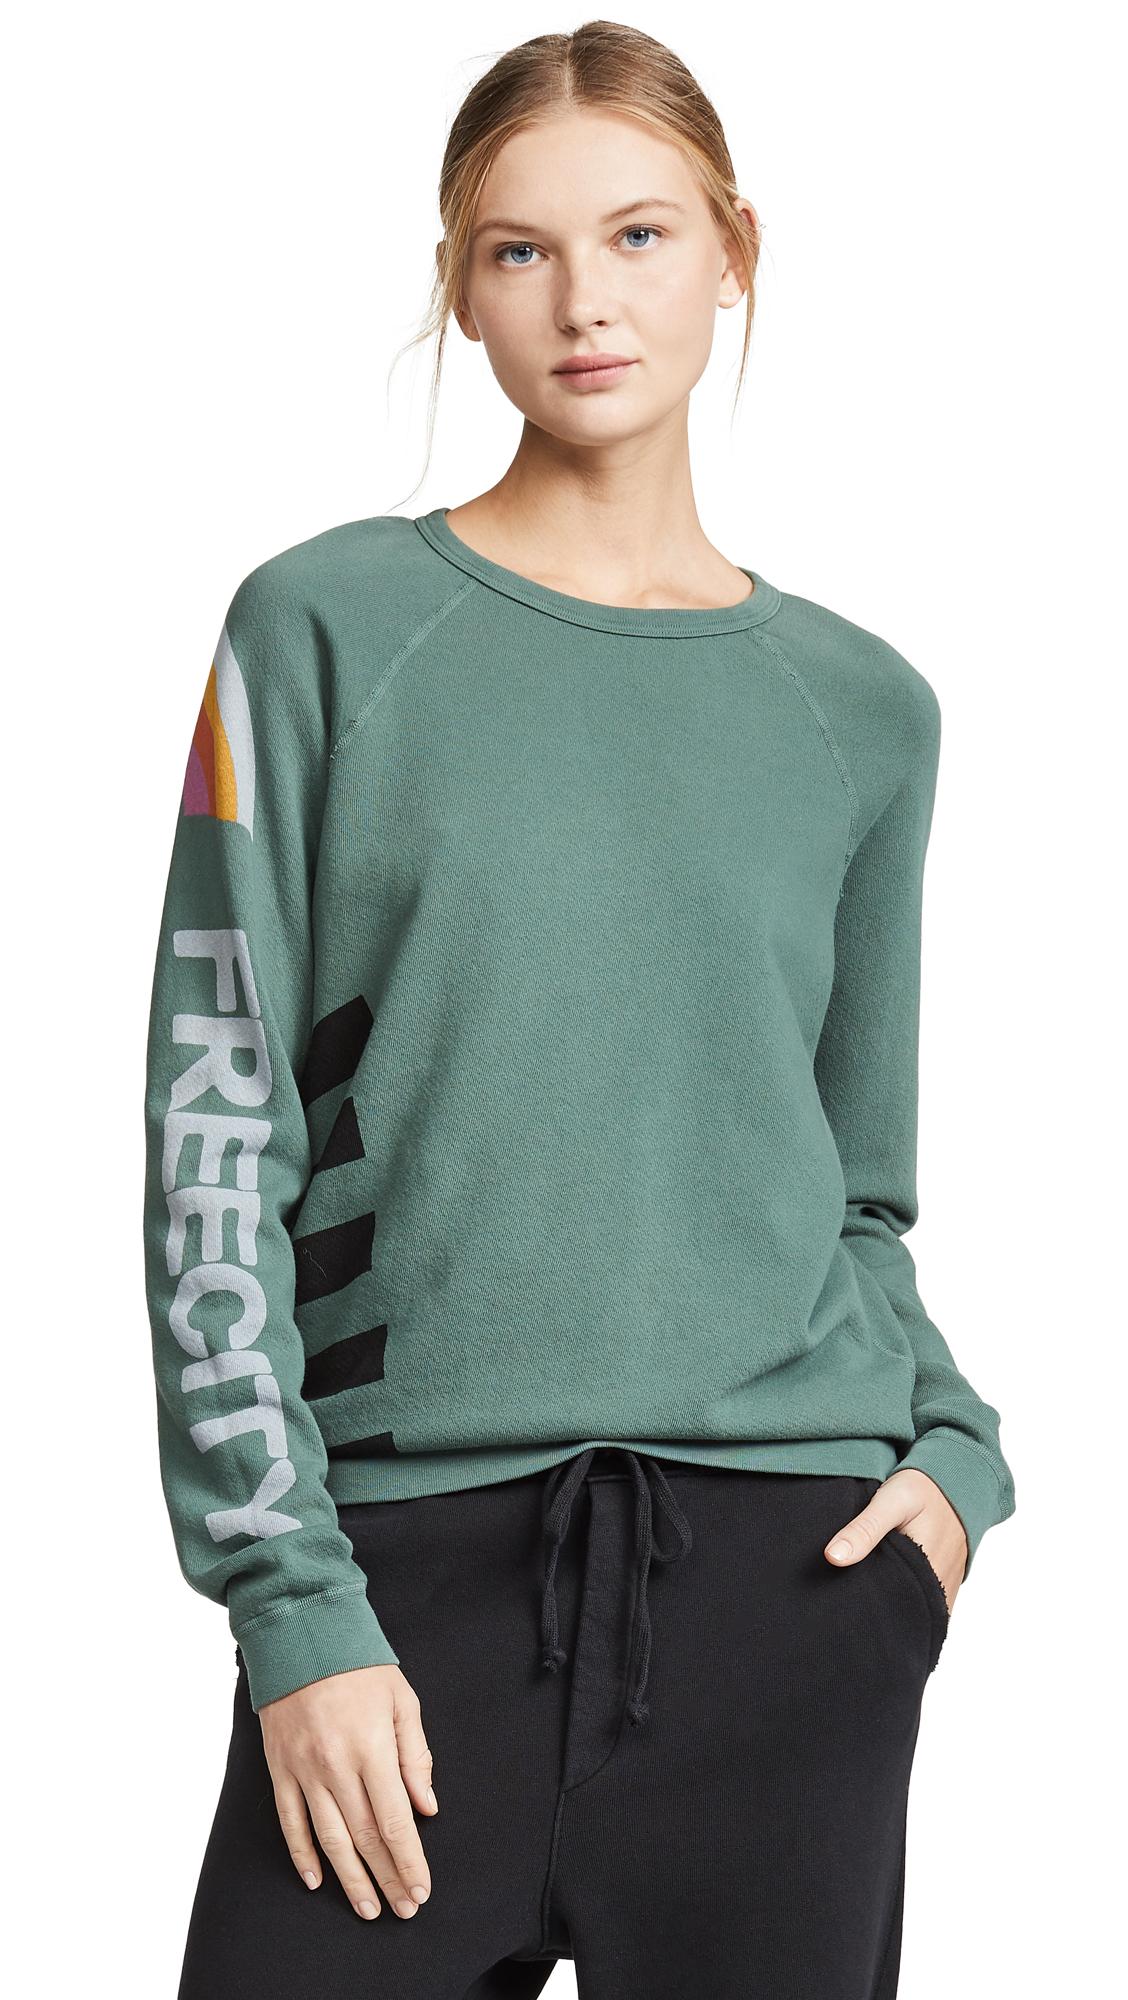 New Free City Unisex Jumpstrikes Raglan Bushjump Printed Pullover Sweater $225